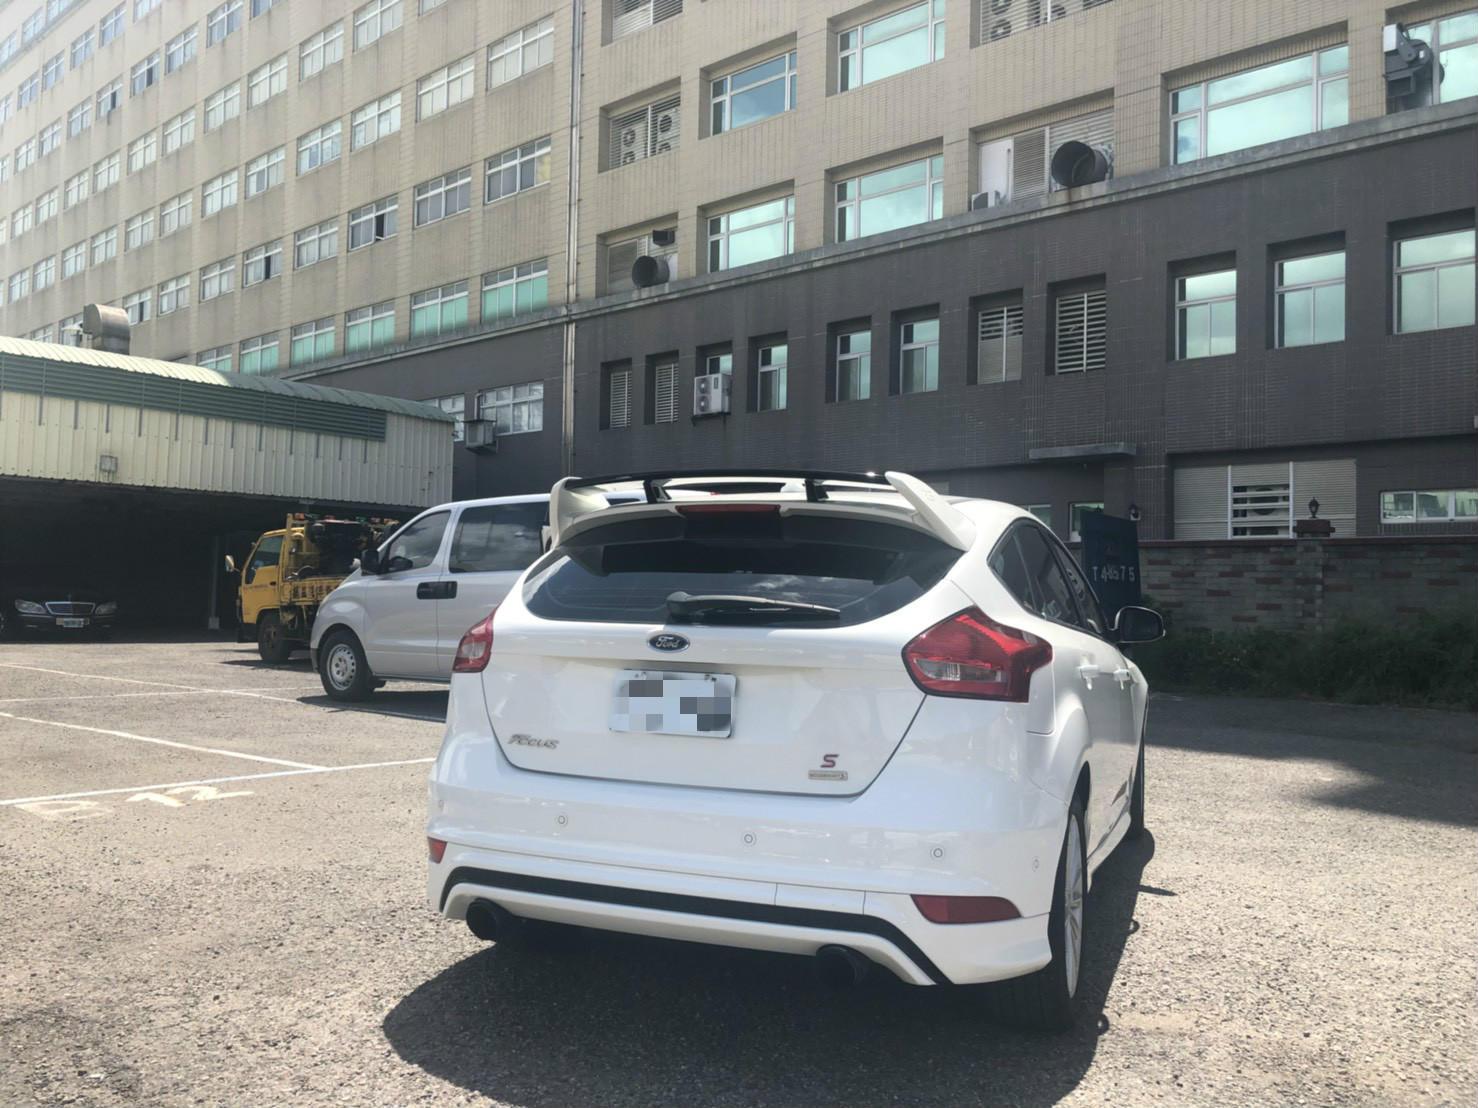 FOCUS 1.5T 有自動停車 全額貸 免頭款 低利率 FB:阿強優質中古車